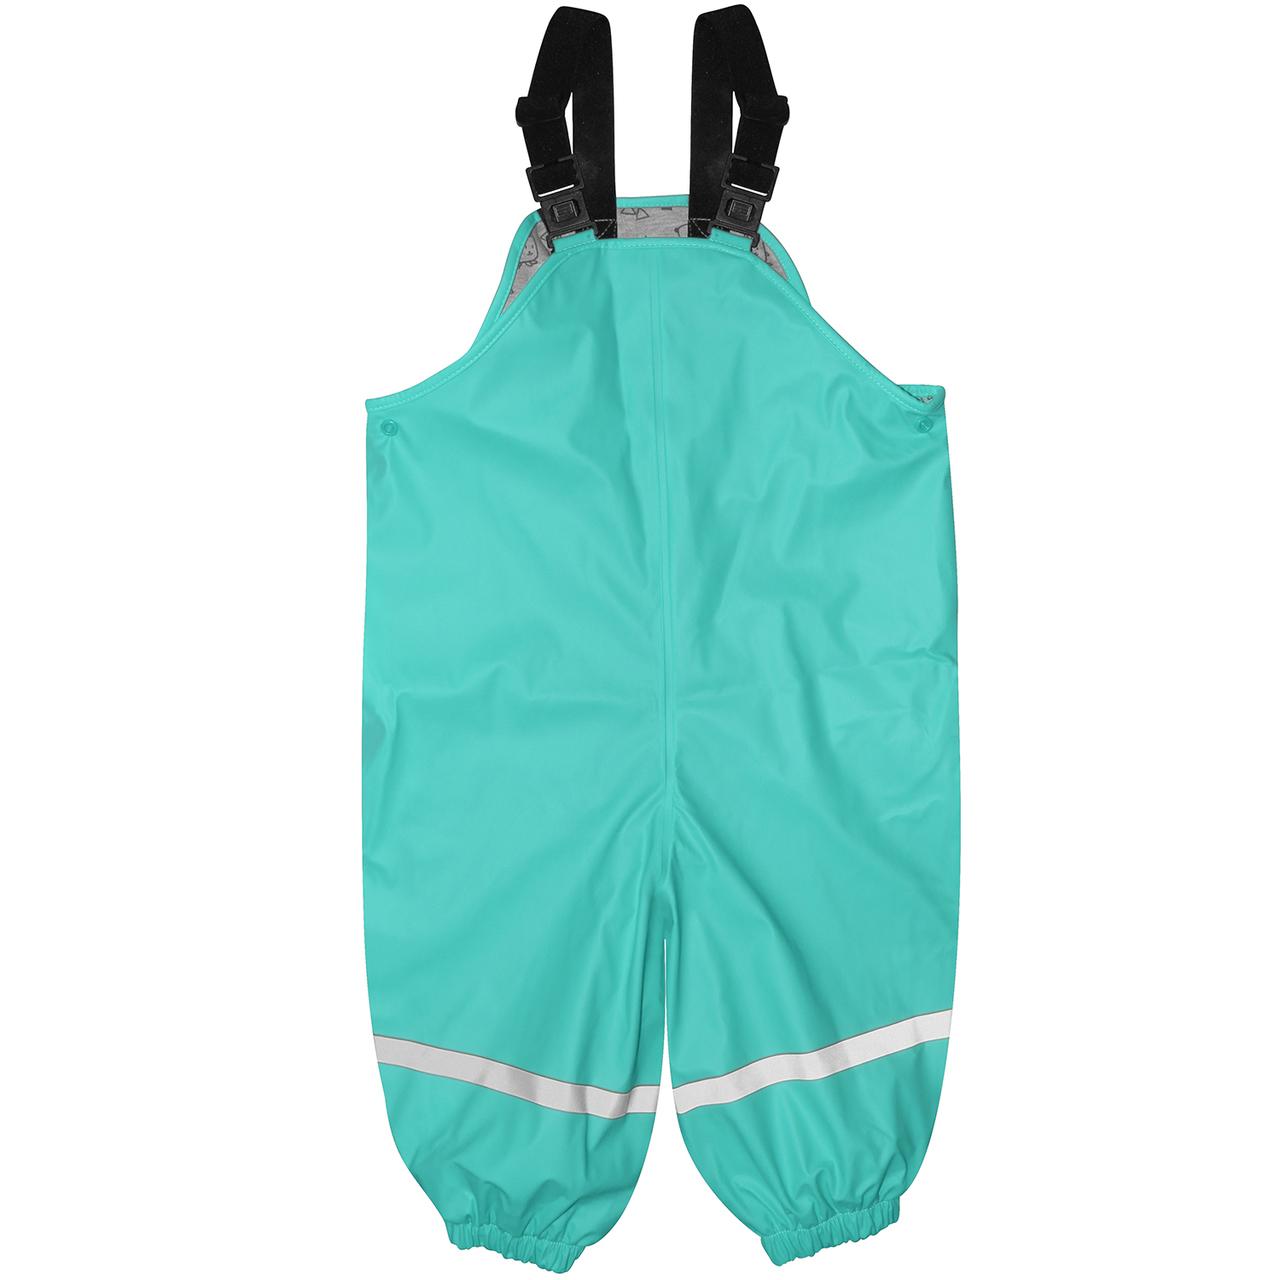 Silly Billyz Waterproof Overalls - Aqua (2-3 Yrs) image